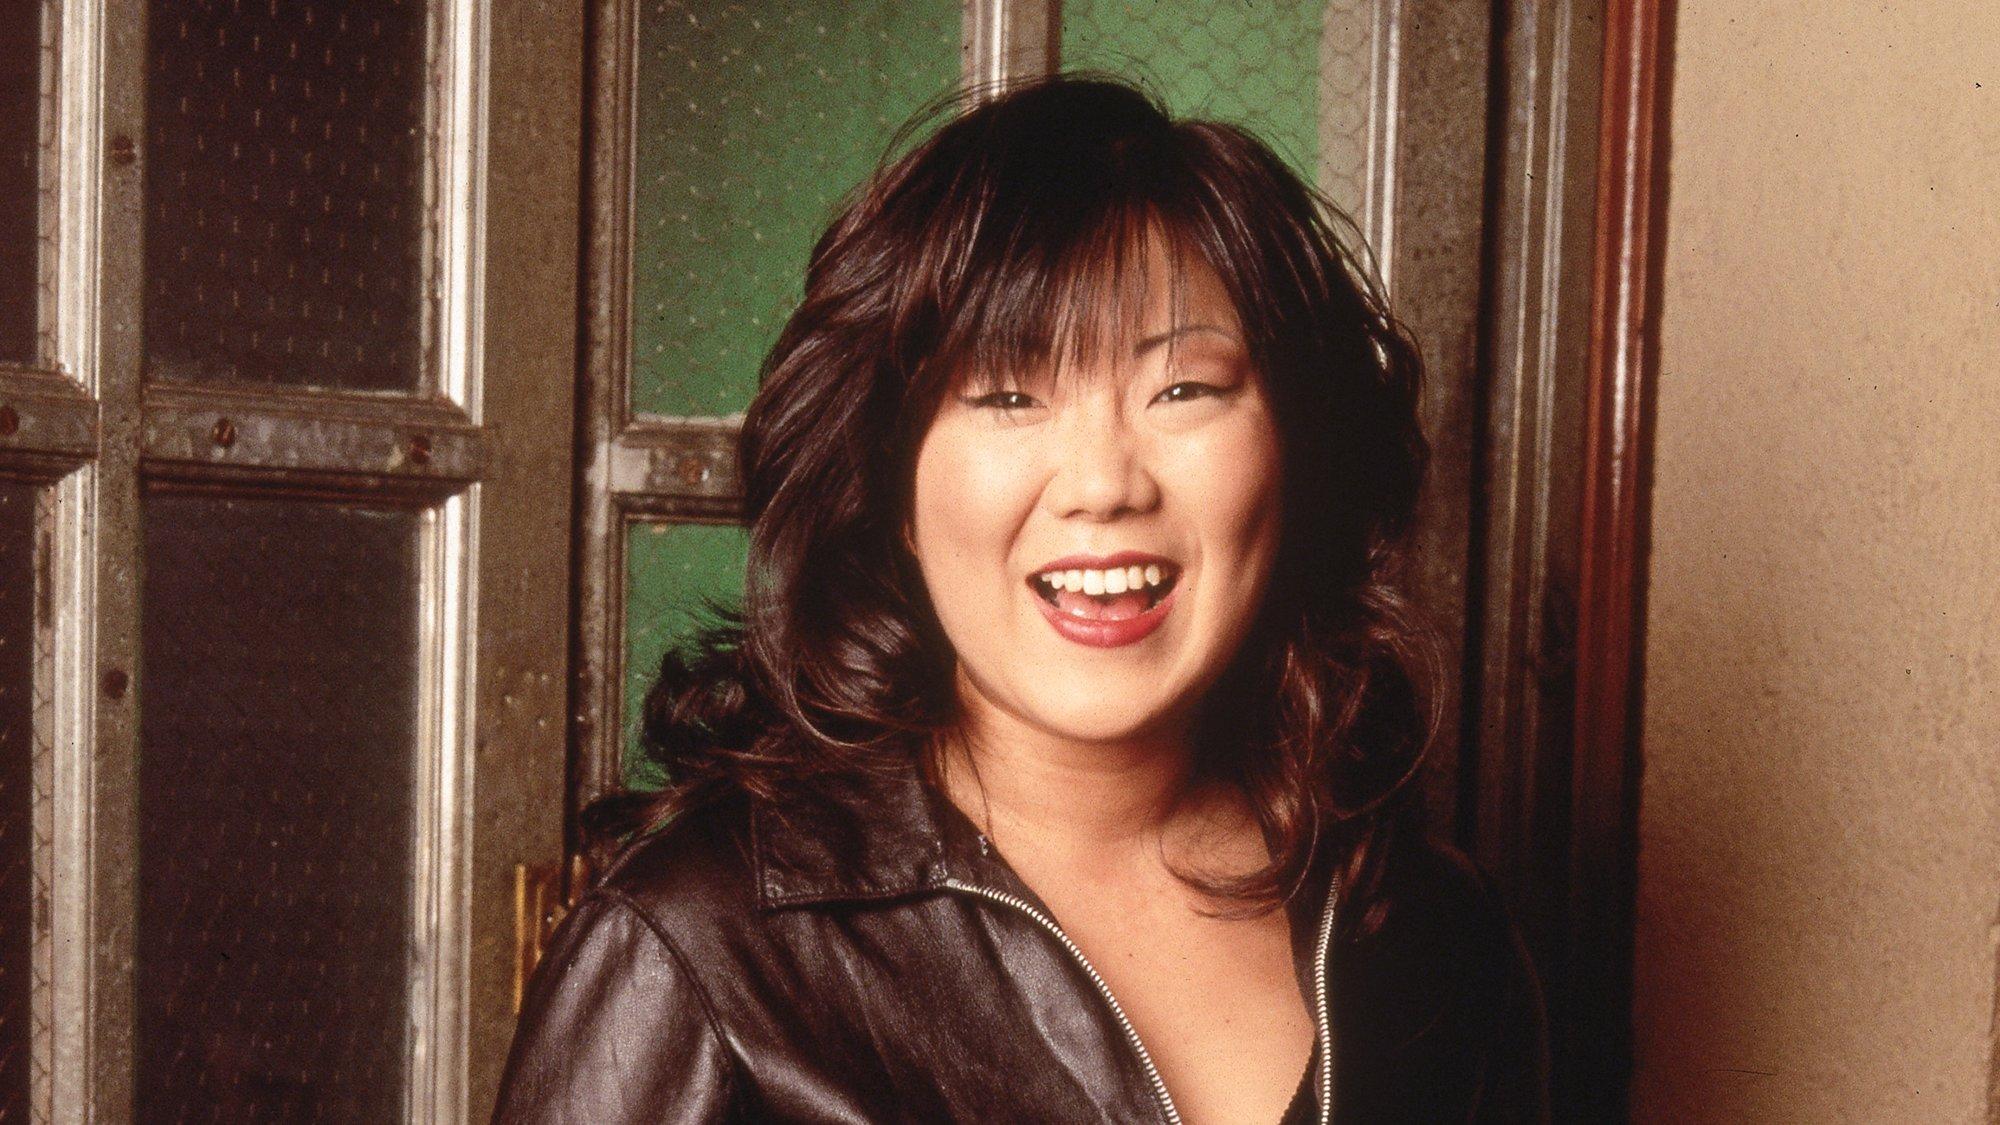 HCHH: Margaret Cho